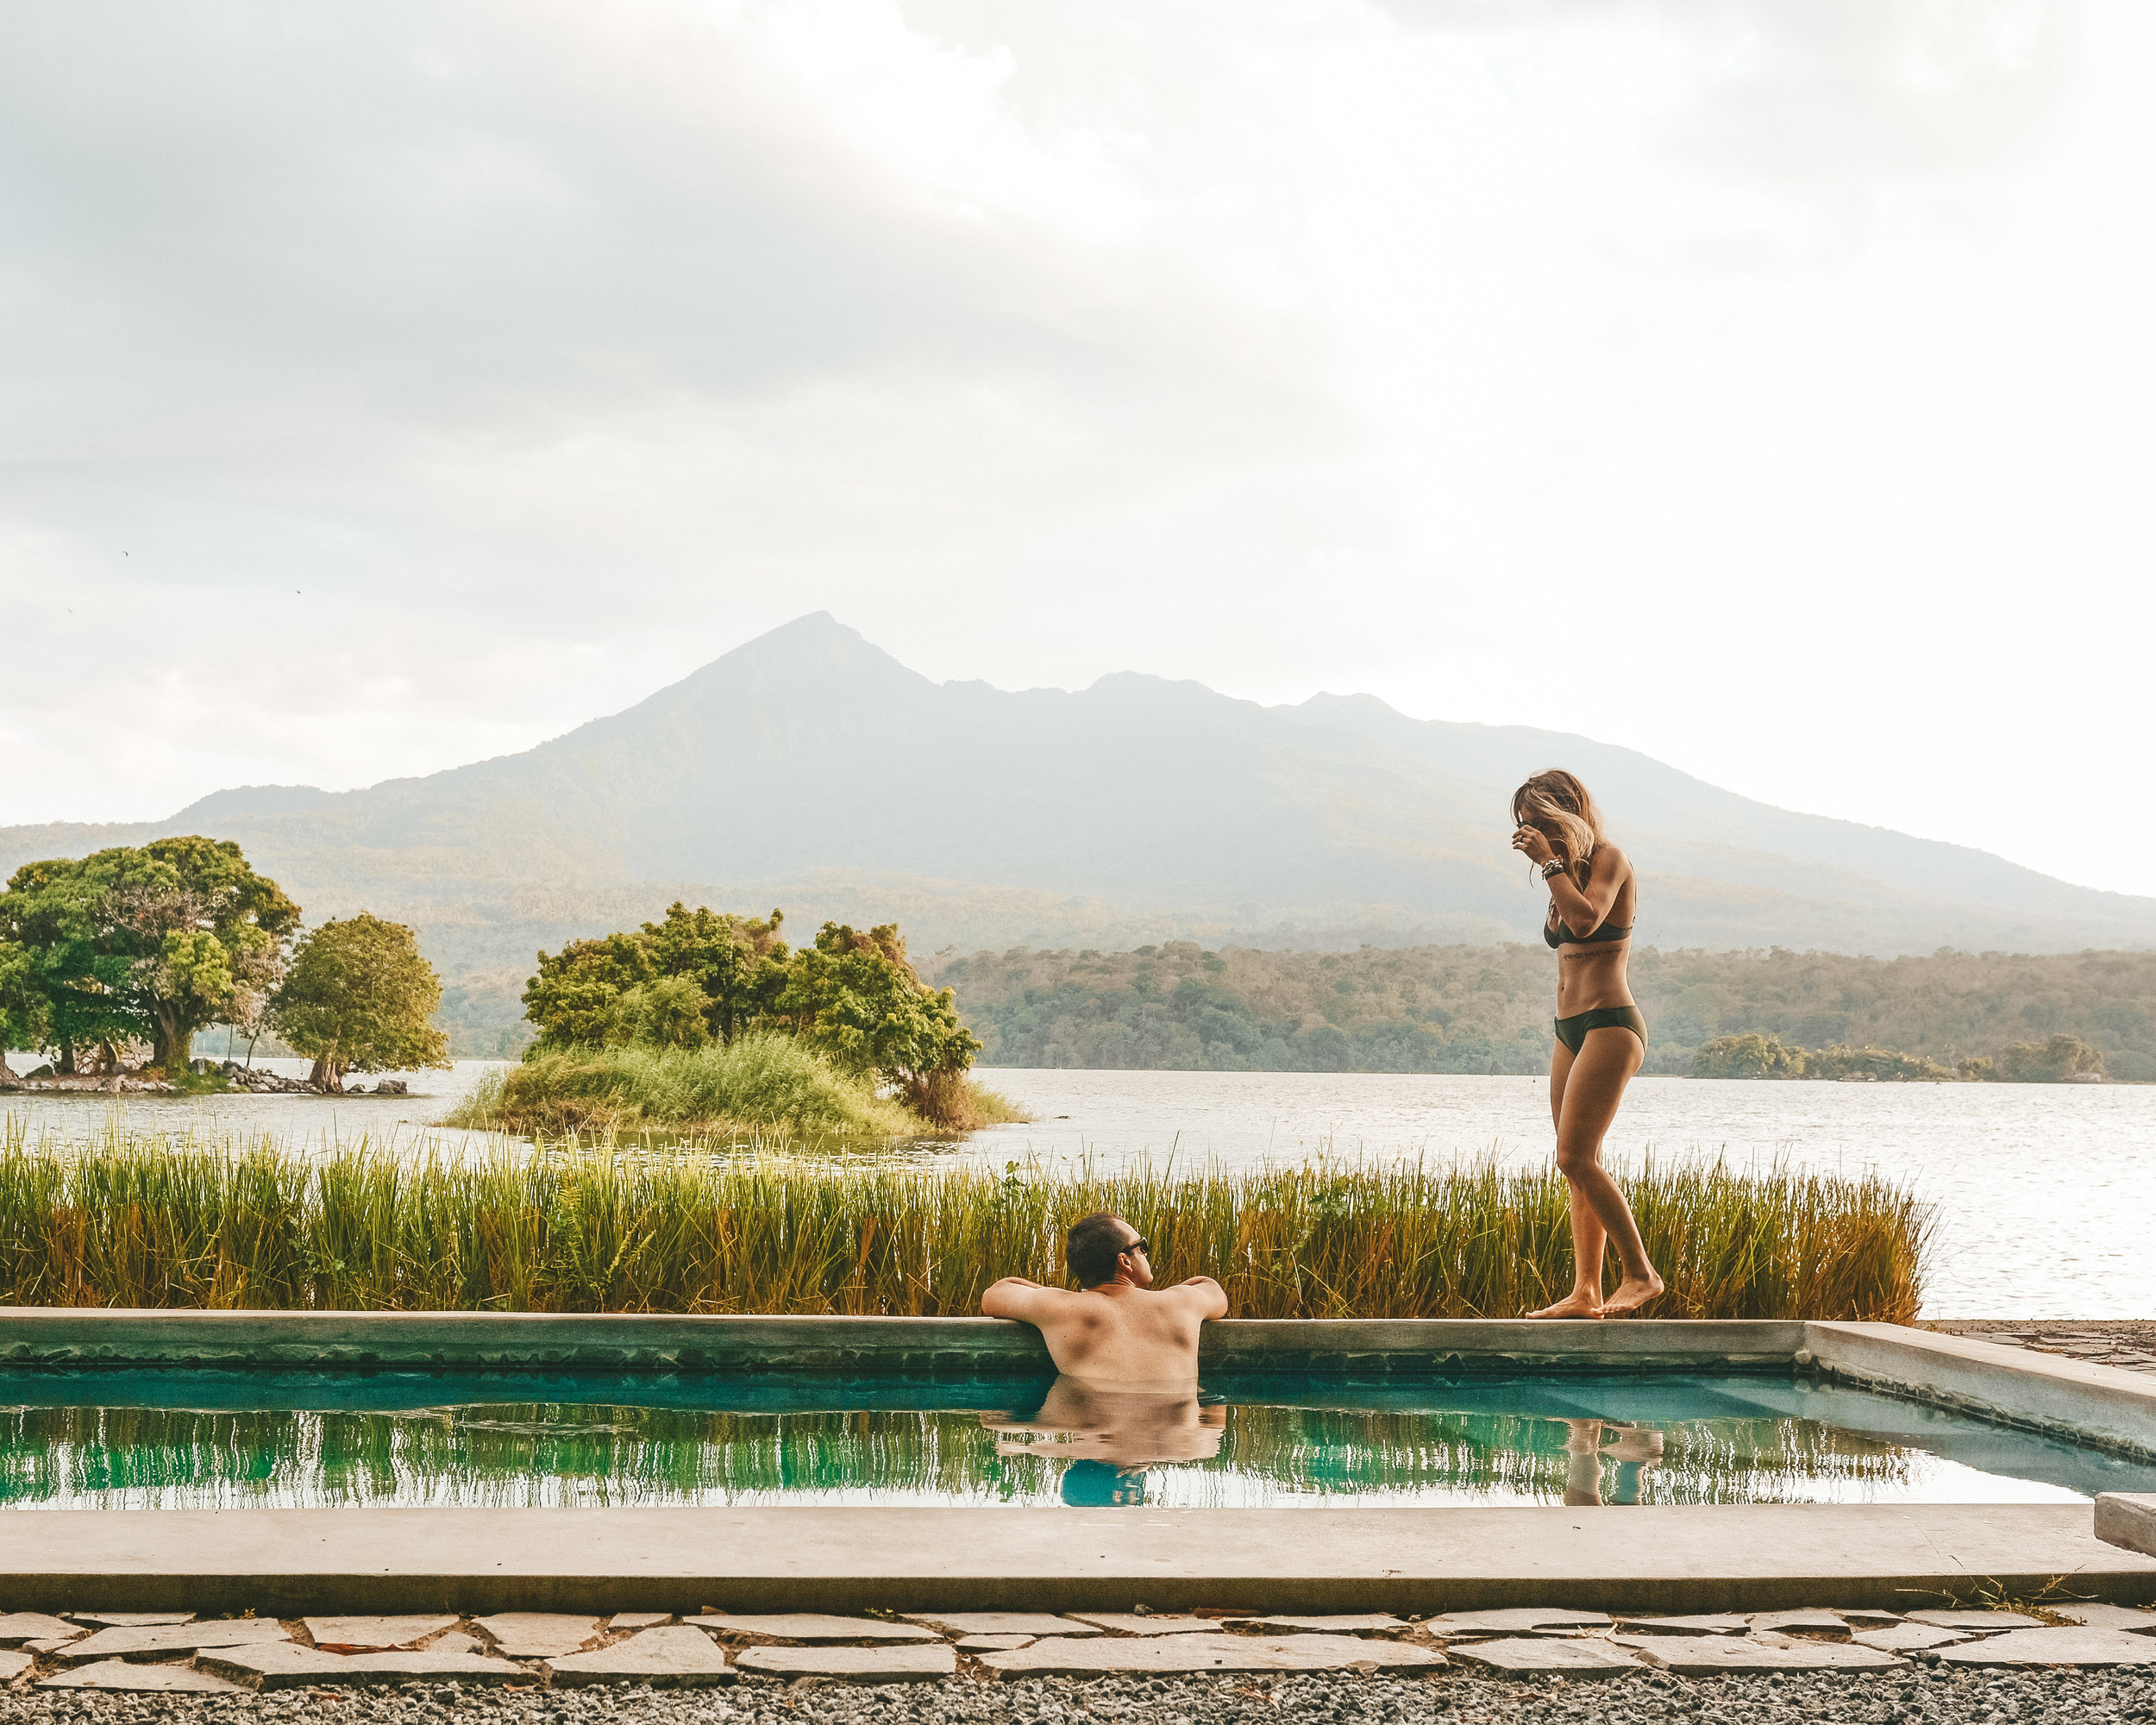 Hanging by the pool at Isleta el Espino